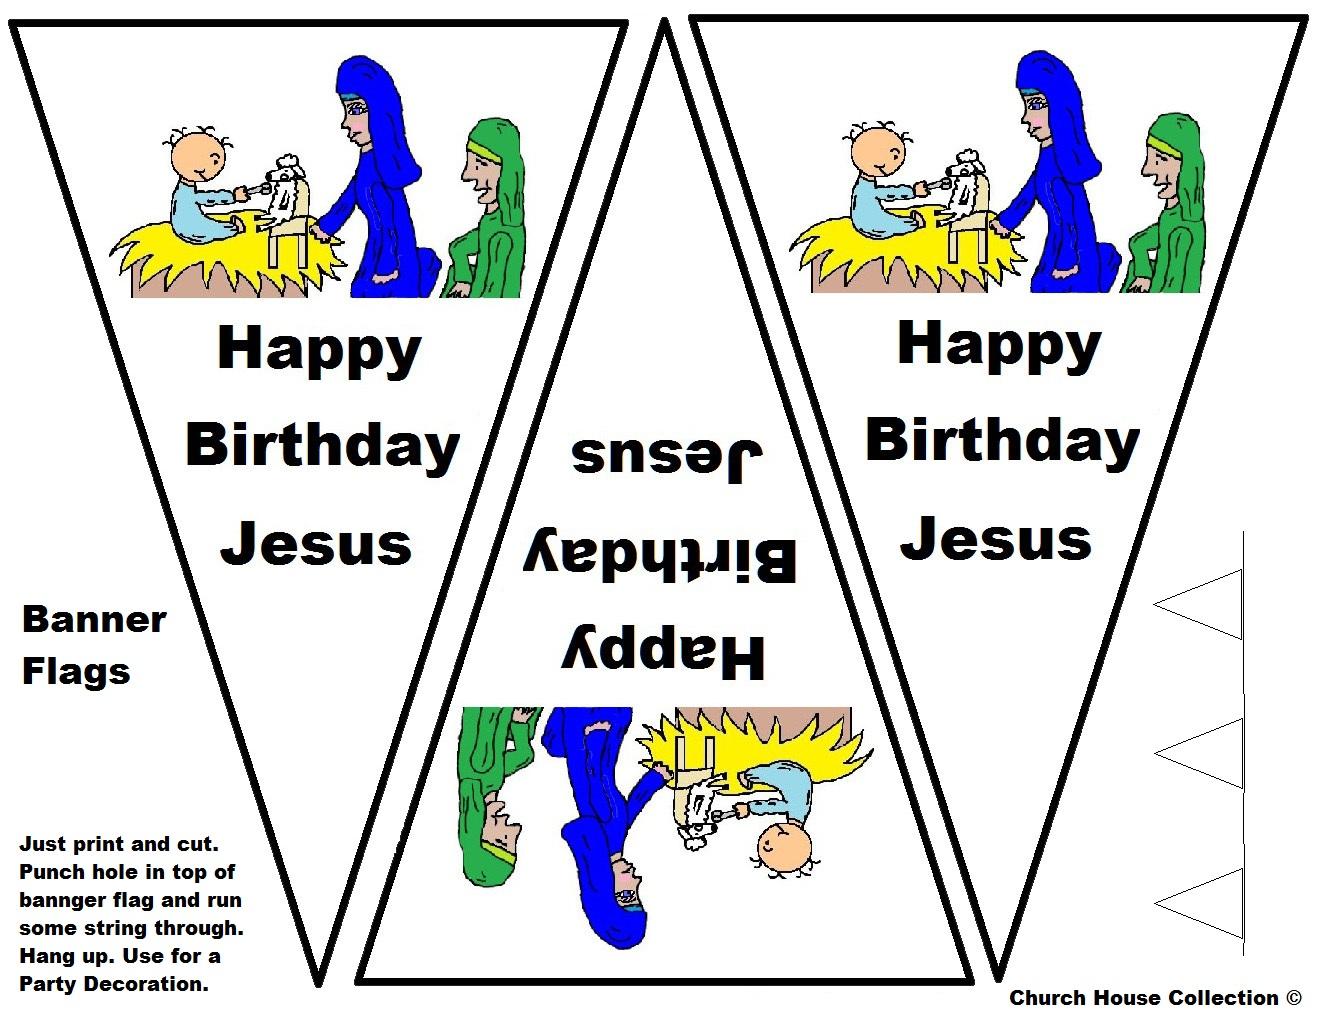 Happy Birthday Jesus Toilet Paper Roll Craft – Happy Birthday Jesus Invitations